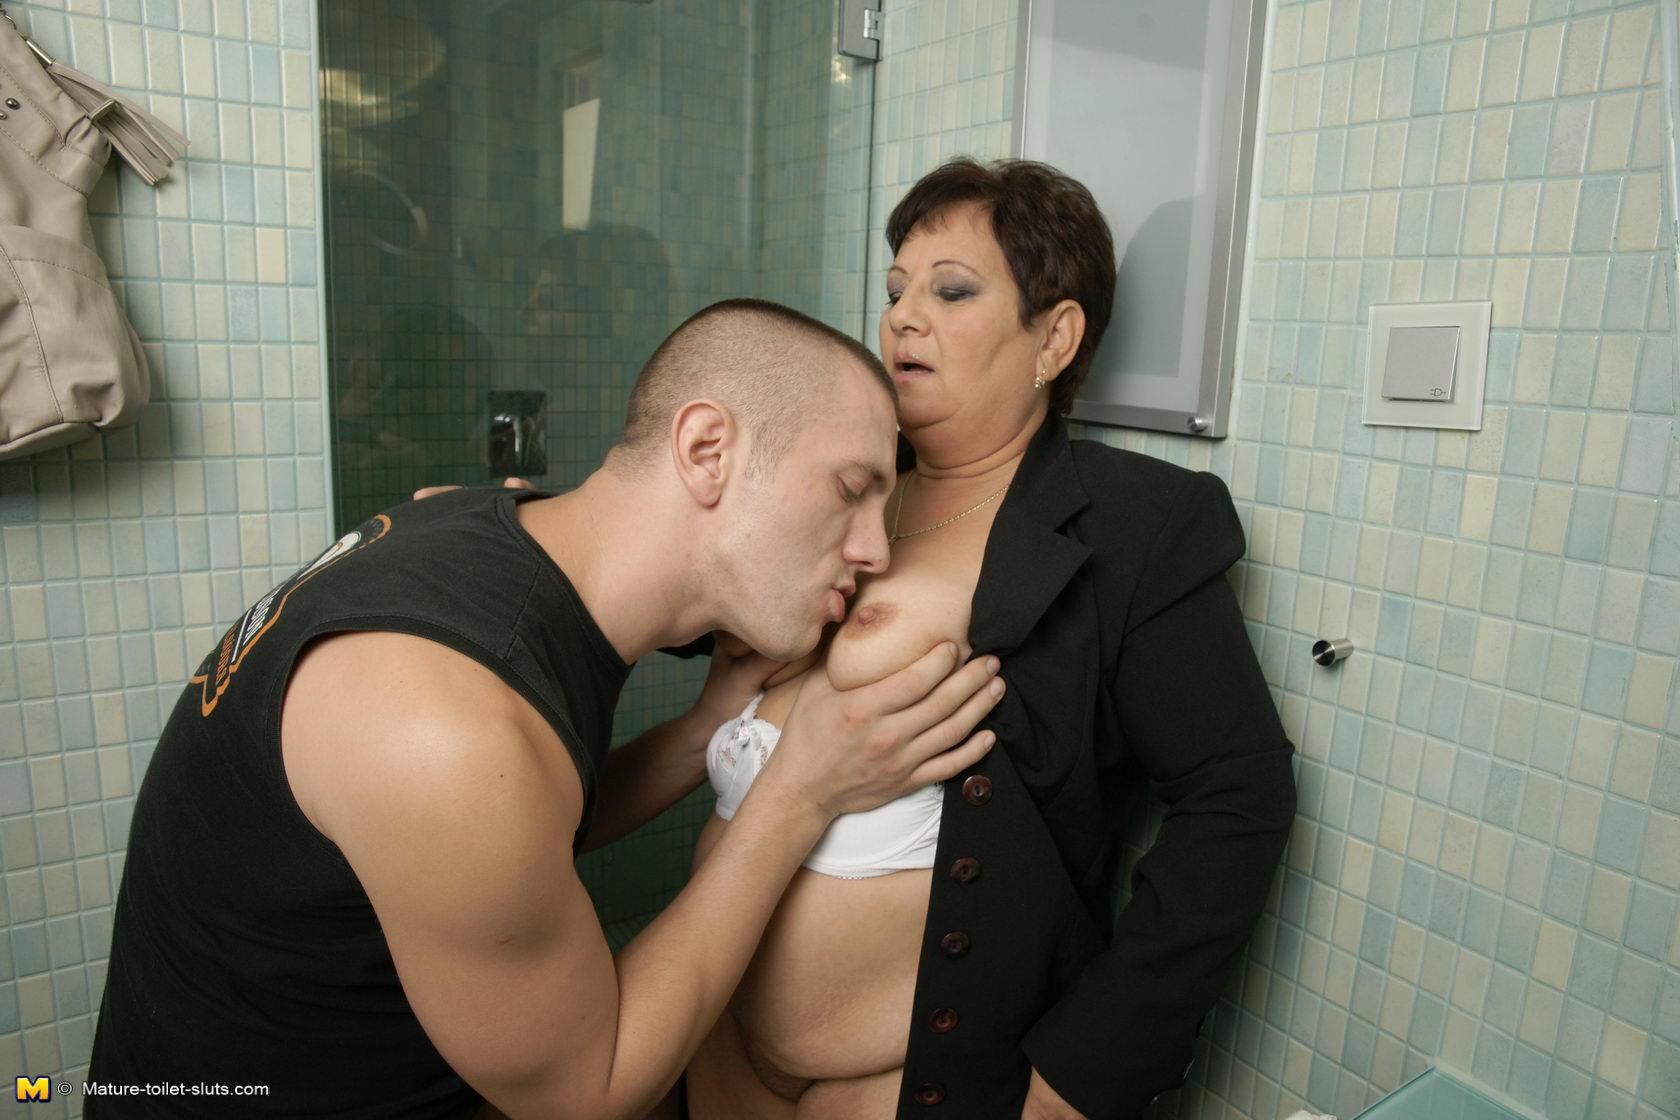 Трахнул тётку в туалете онлайн 1 фотография